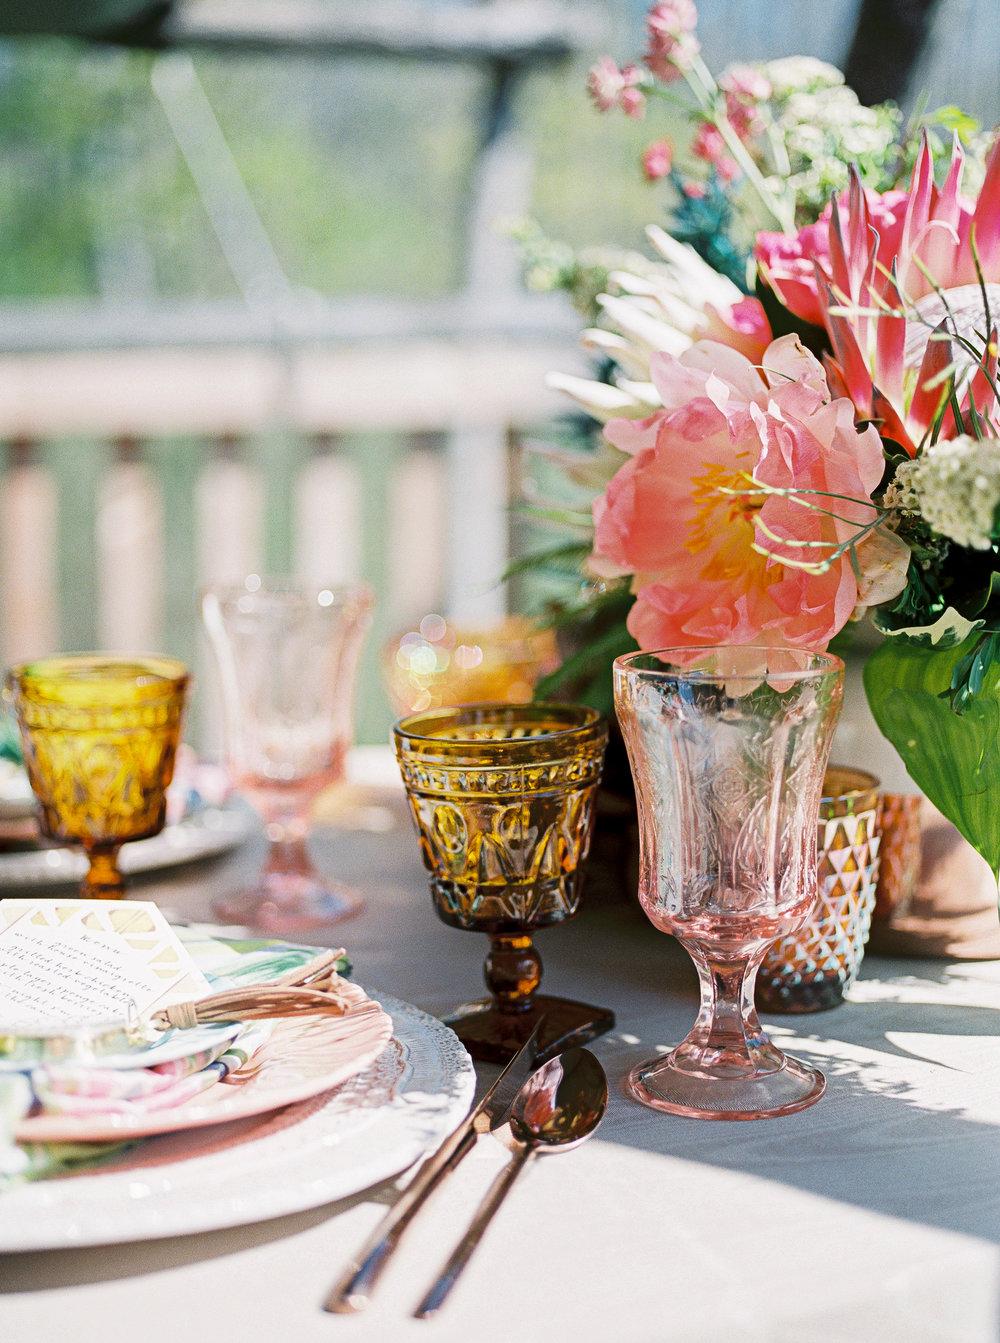 Rochester NY Louelle Design Studio Floral Boho Wedding Menu Stacy K Floral Alexandra Elise Photography.jpg